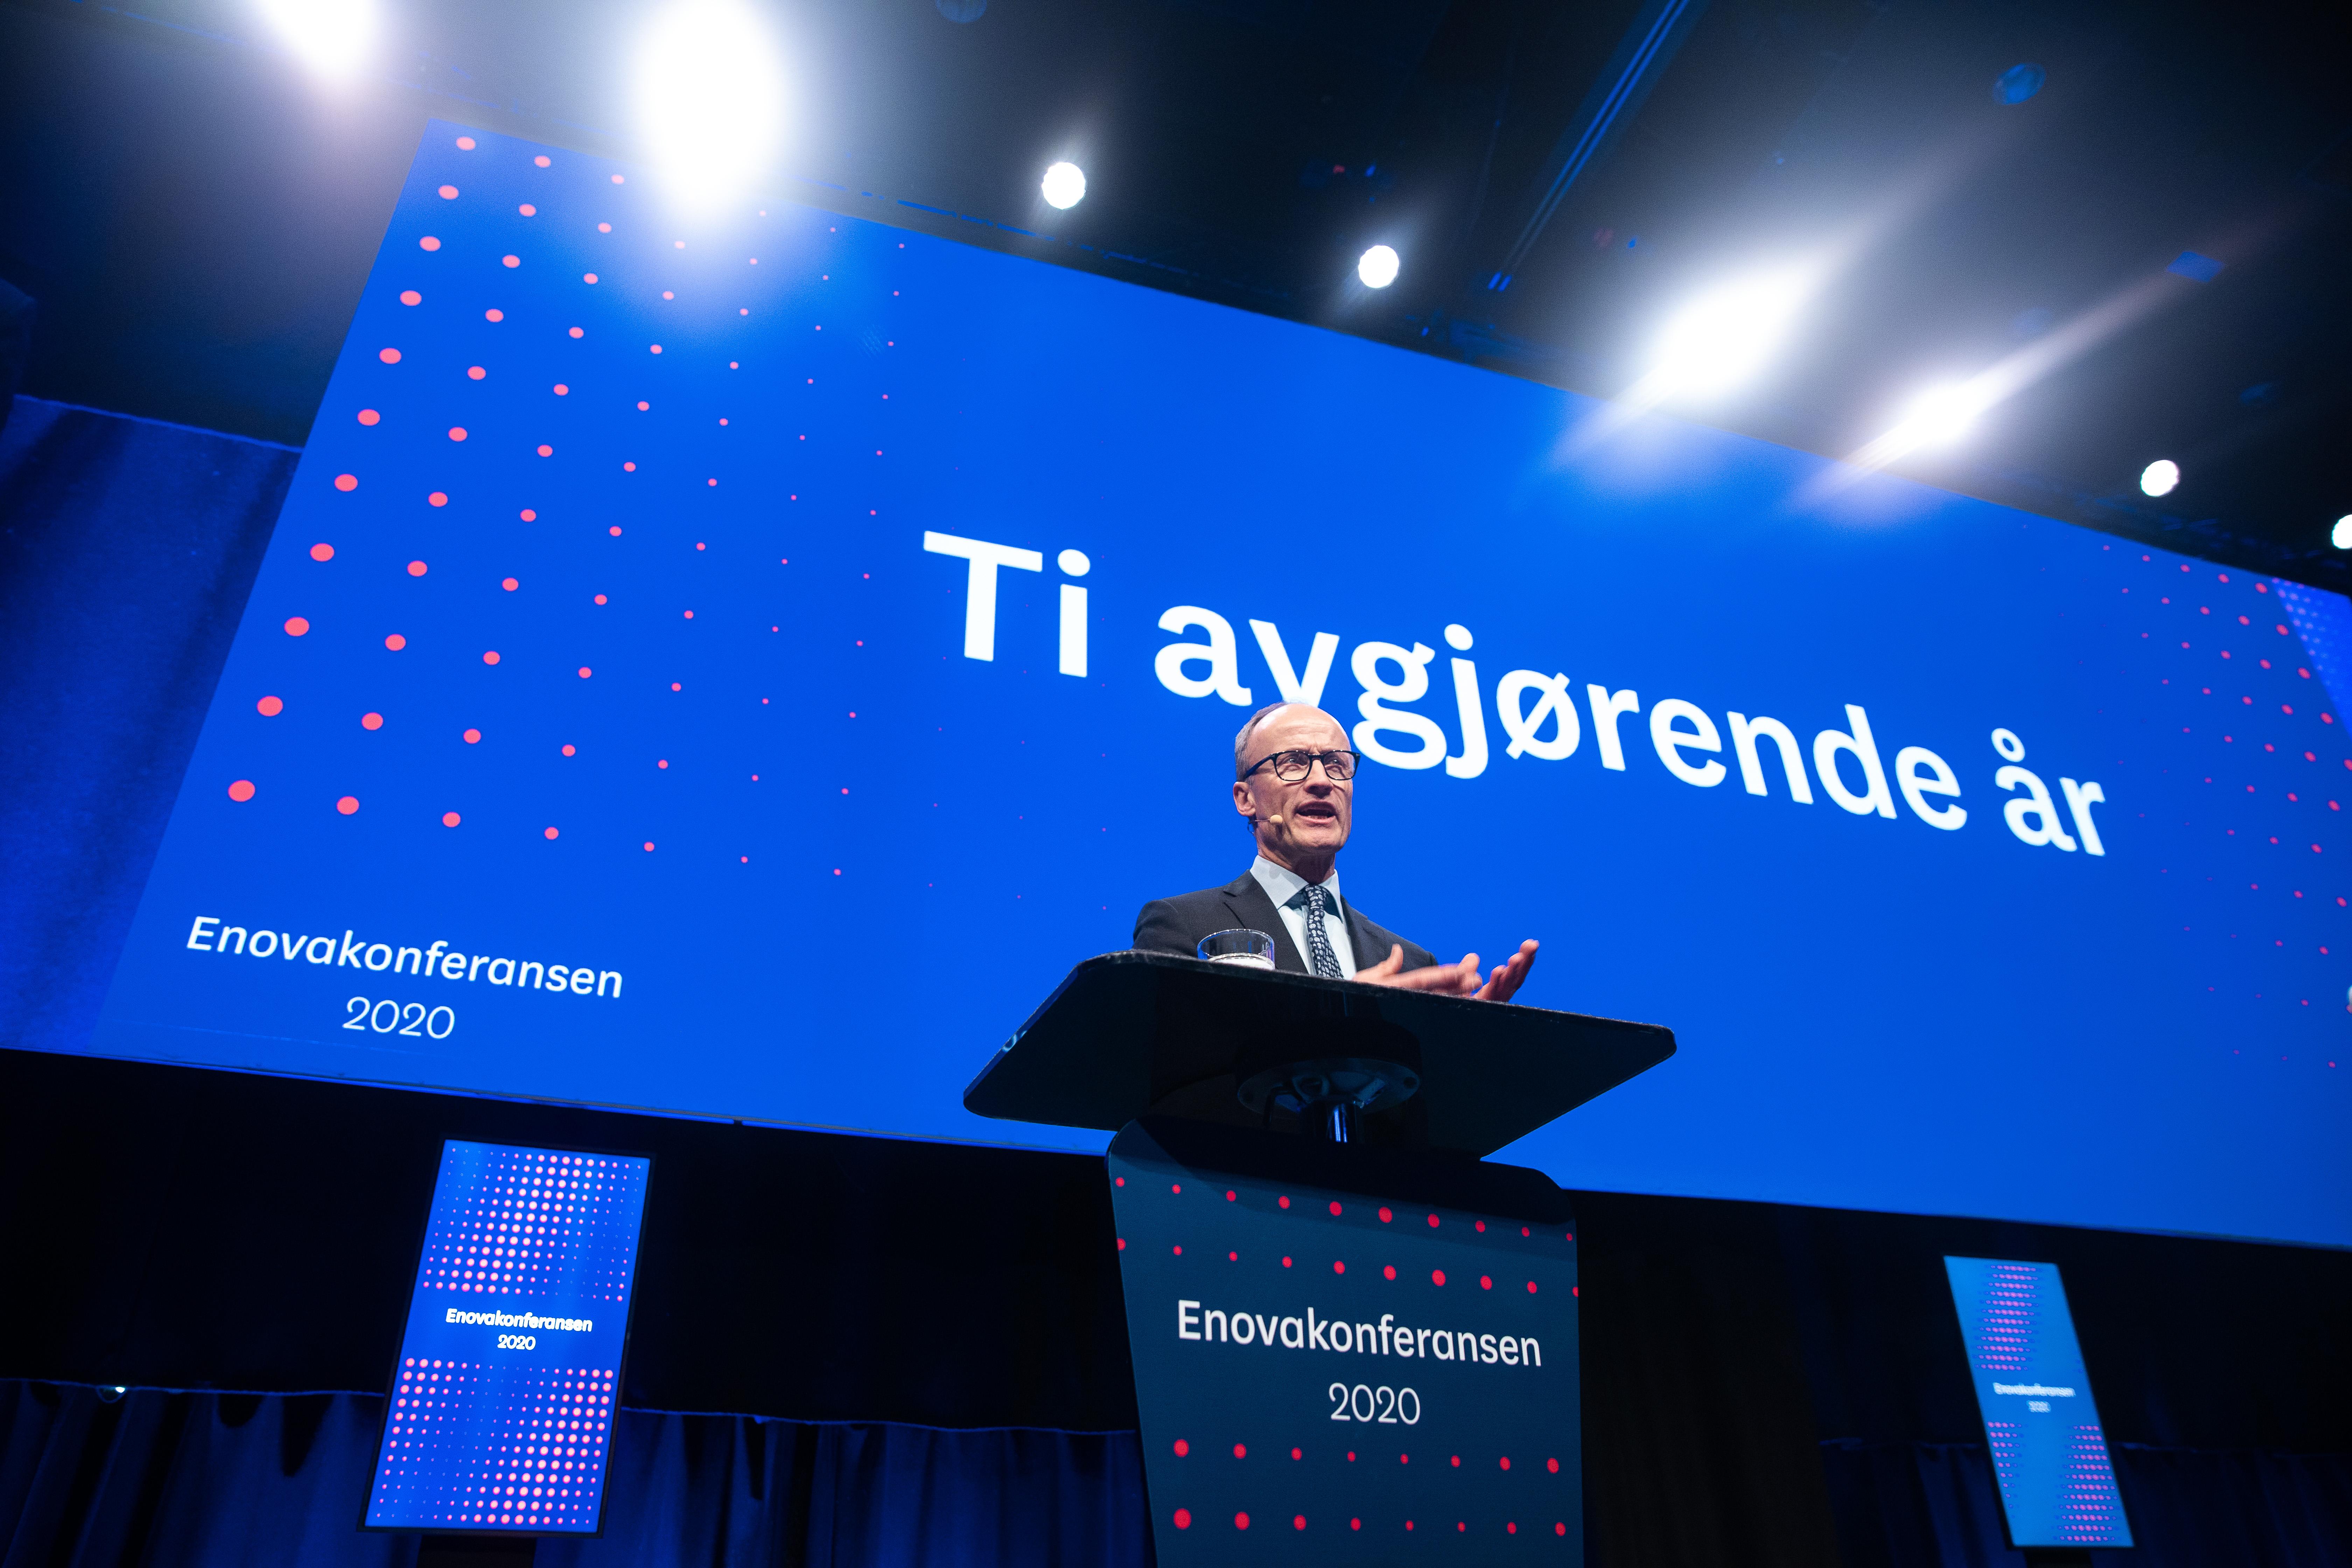 Enova-direktør Nils Kristian Nakstad åpner Enovakonferansen tirsdag 28. januar 2020. Foto: Kilian Munch / Enova